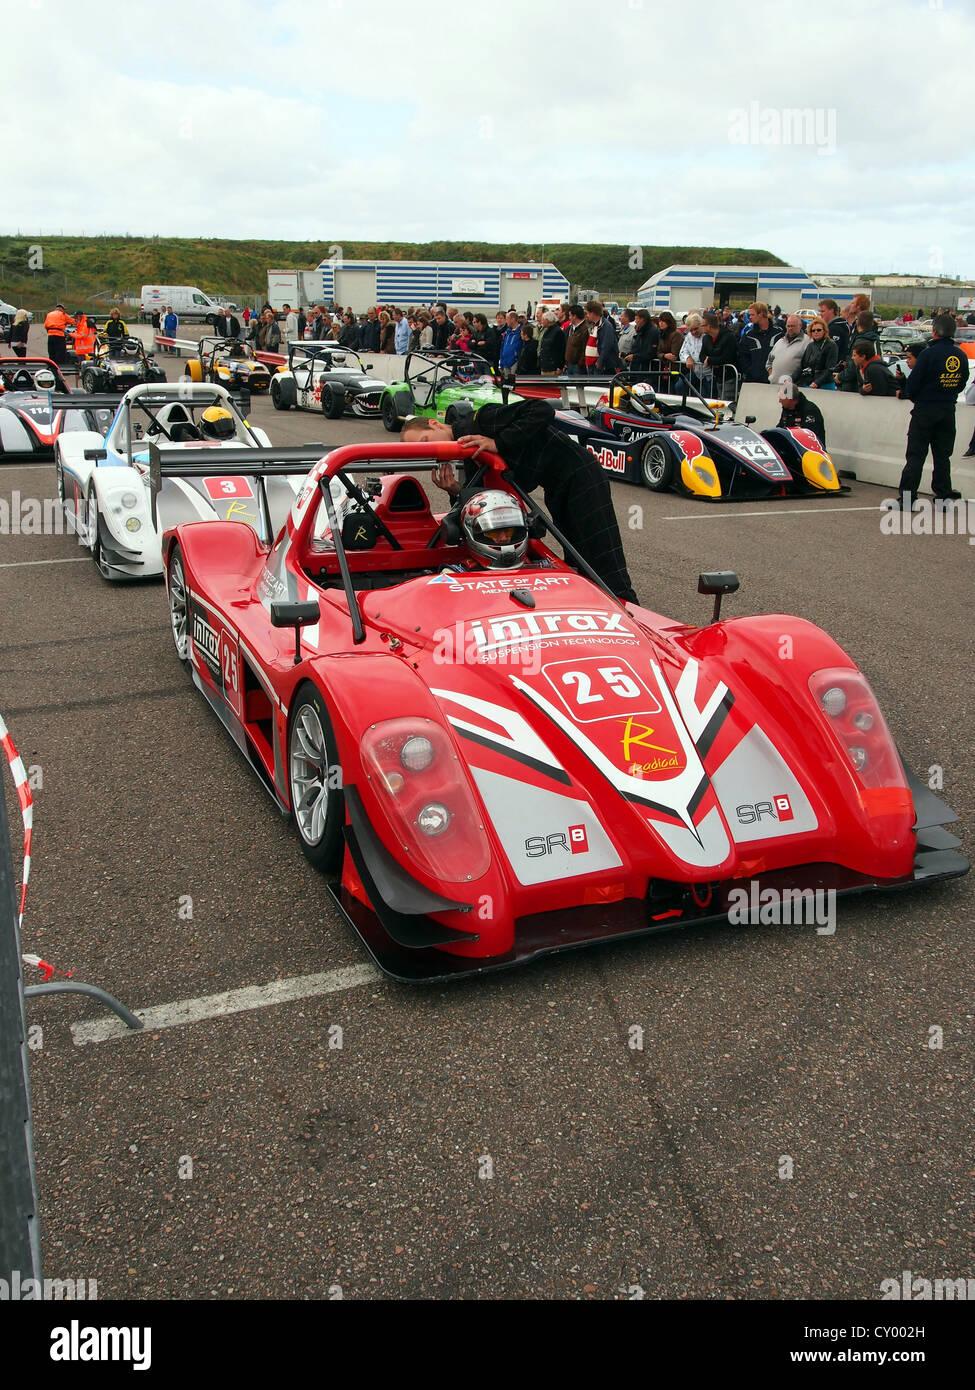 Radical SR8 race car Stock Photo: 51016521 - Alamy